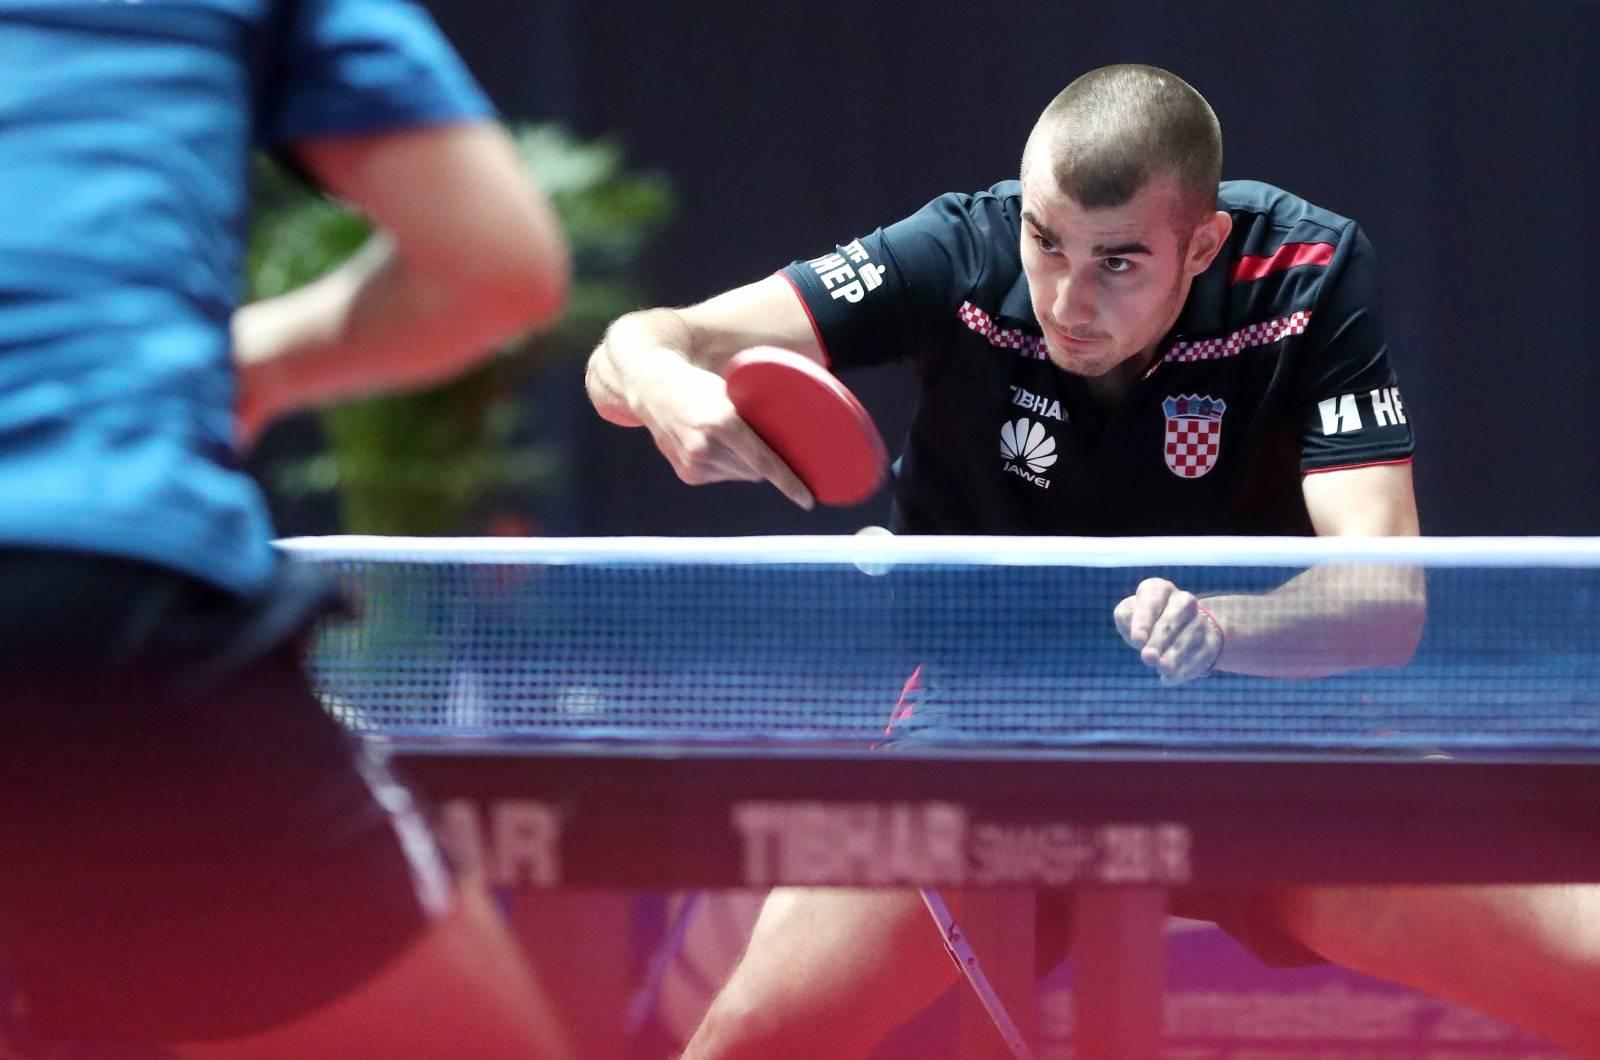 Zagreb: Hrvatski stolnotenisač Tomislav Pucar osvojio je brončanu medalju na Zagreb Openu